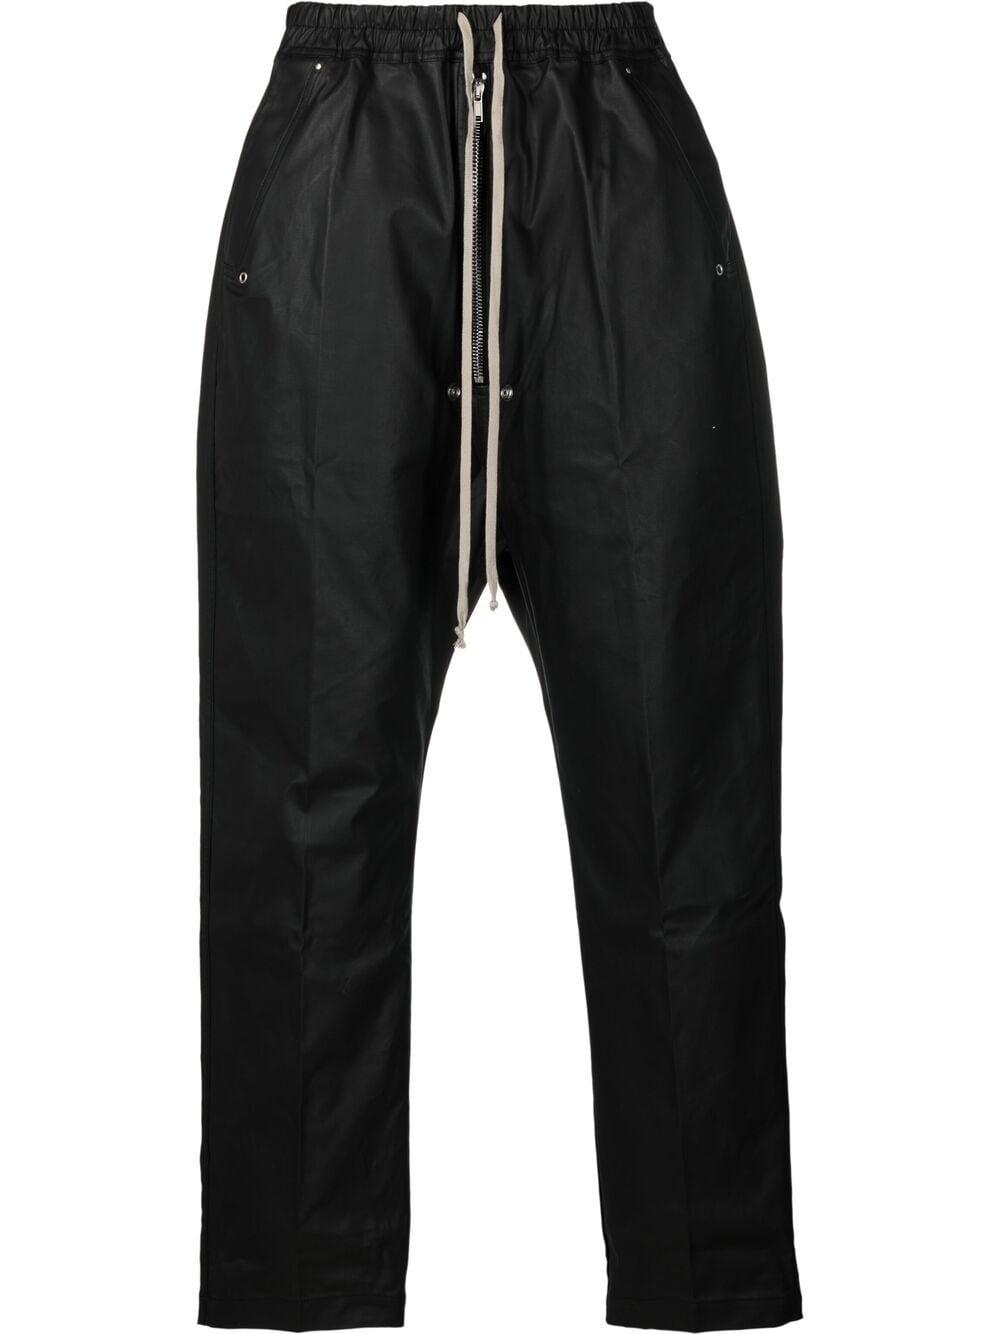 Rick Owens Drkshdw pantaloni a cavallo basso uomo nero RICK OWENS DRKSHDW | Pantaloni | DU21S2377 TWR09